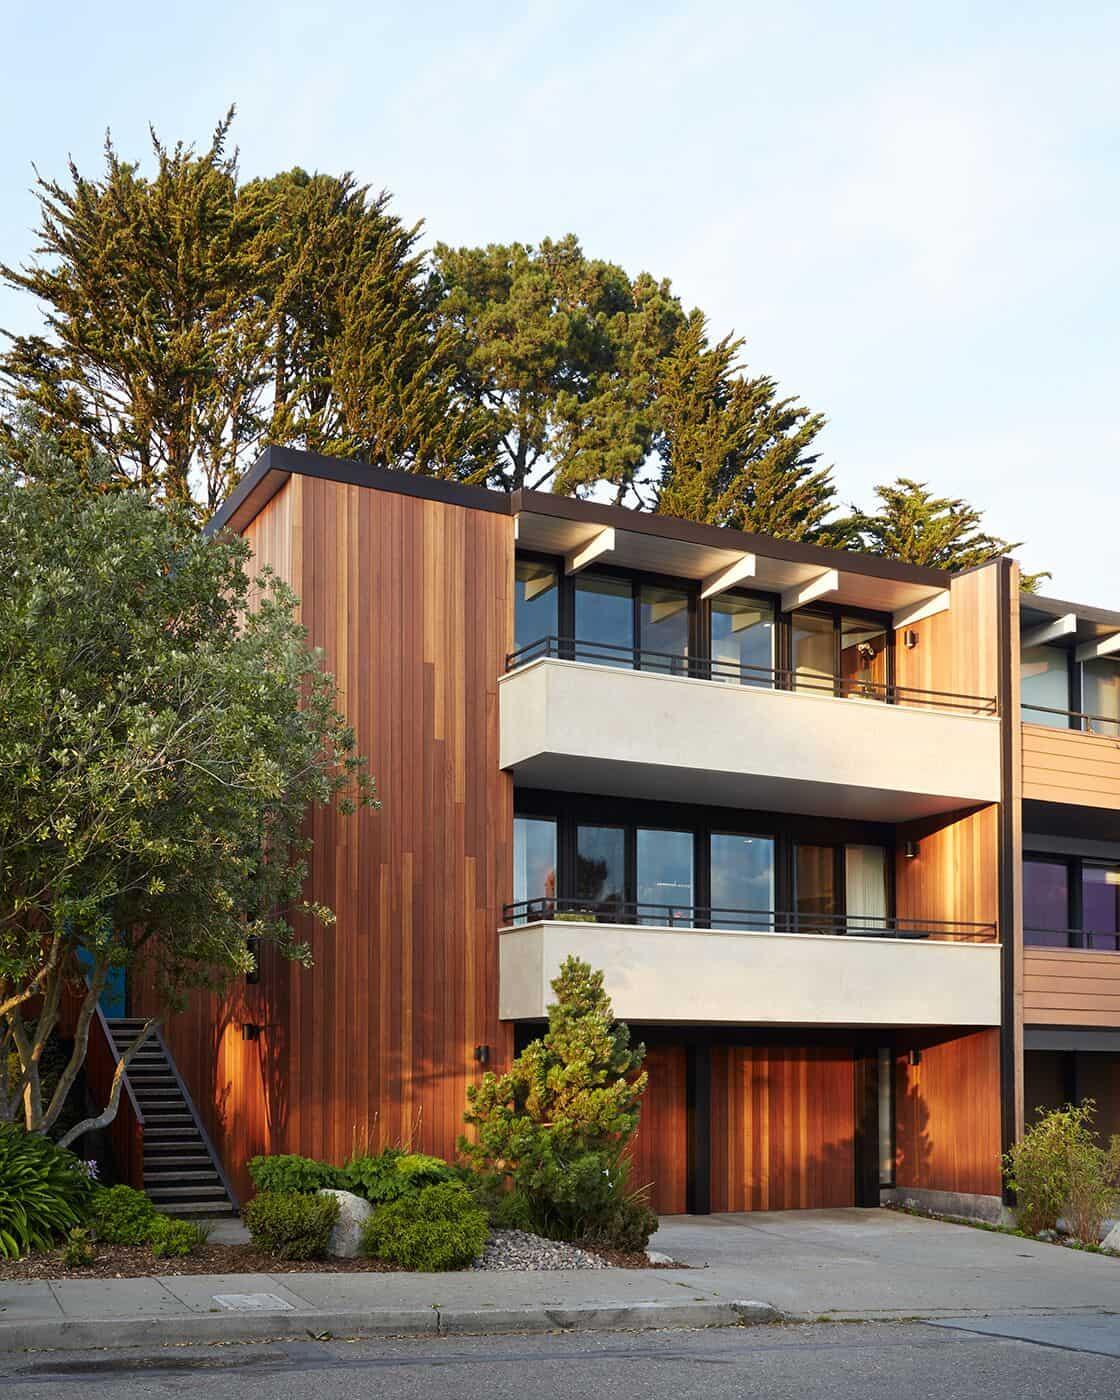 San Francisco Eichler Remodel-Klopf Architecture-03-1 Kindesign